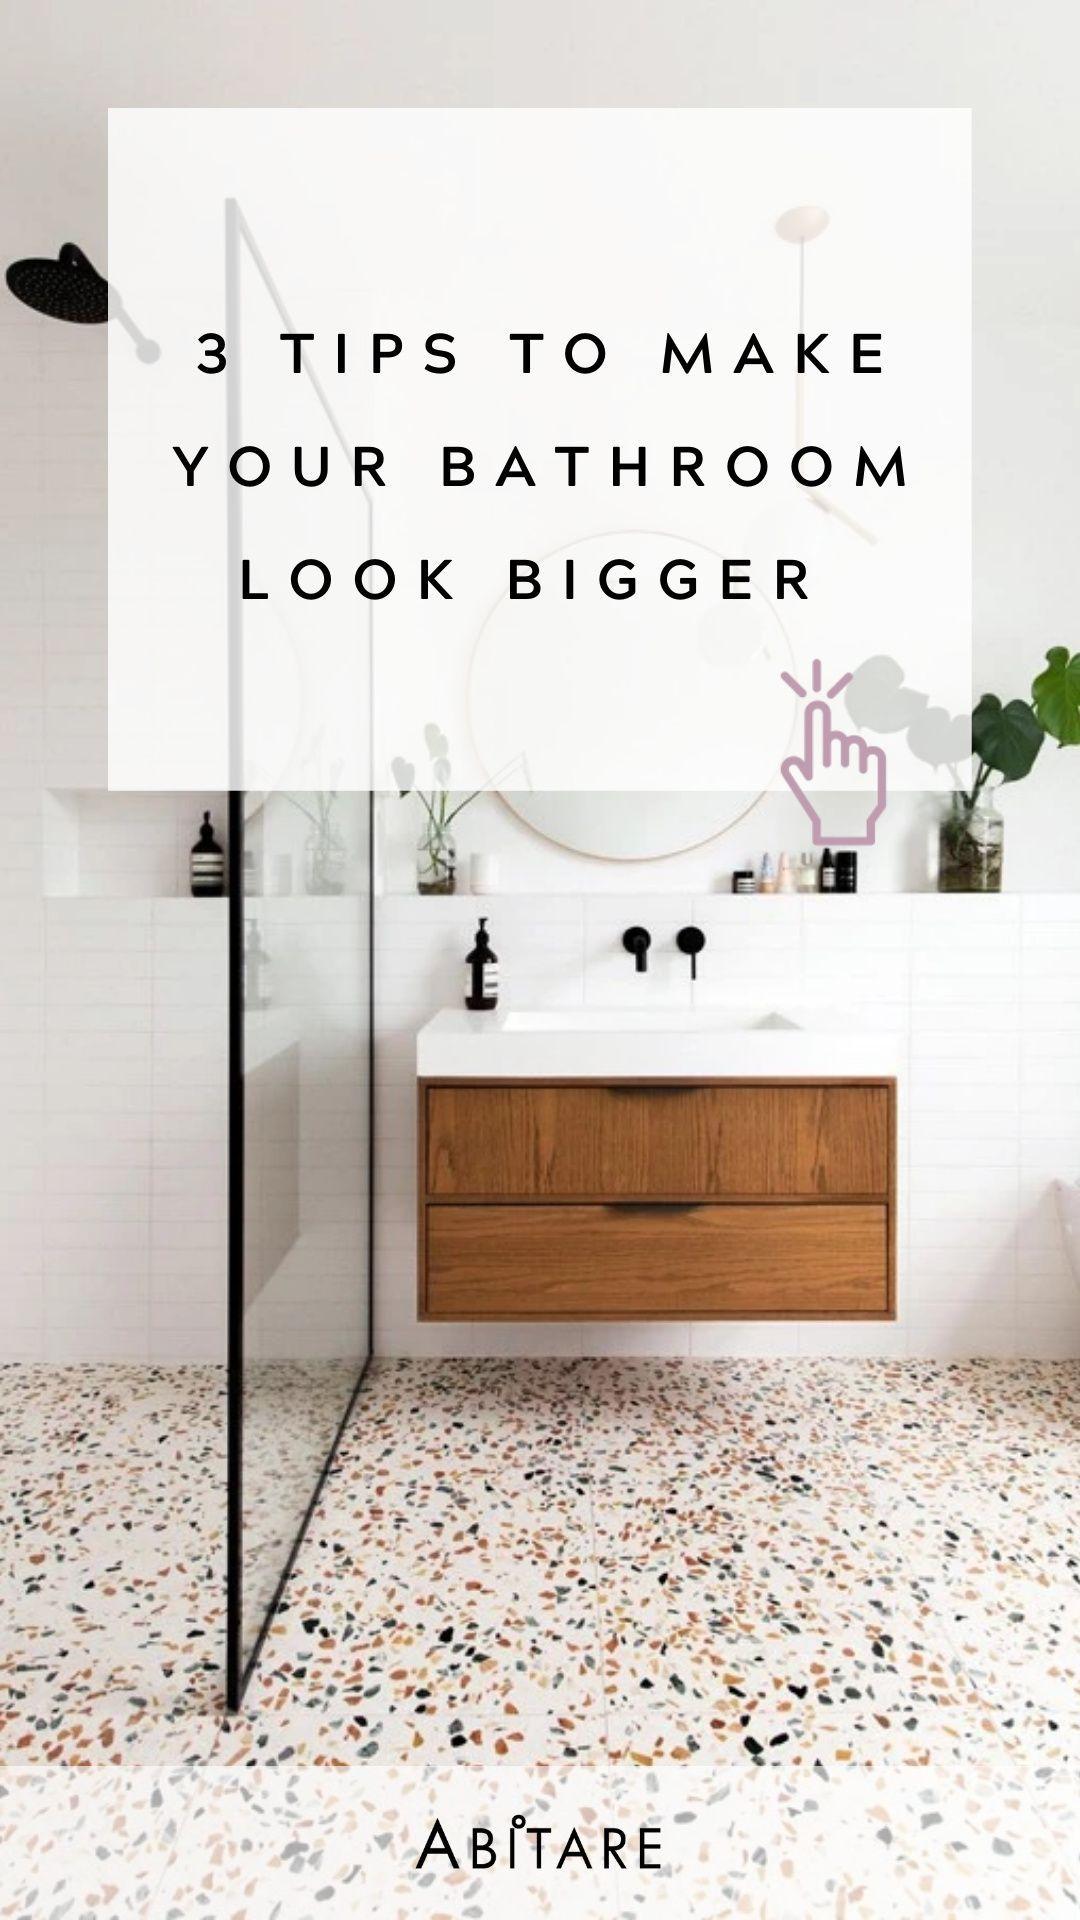 Make A Small Bathroom Look Bigger In 2020 Small Bathroom Great Interior Design Challenge Interior Design Masters